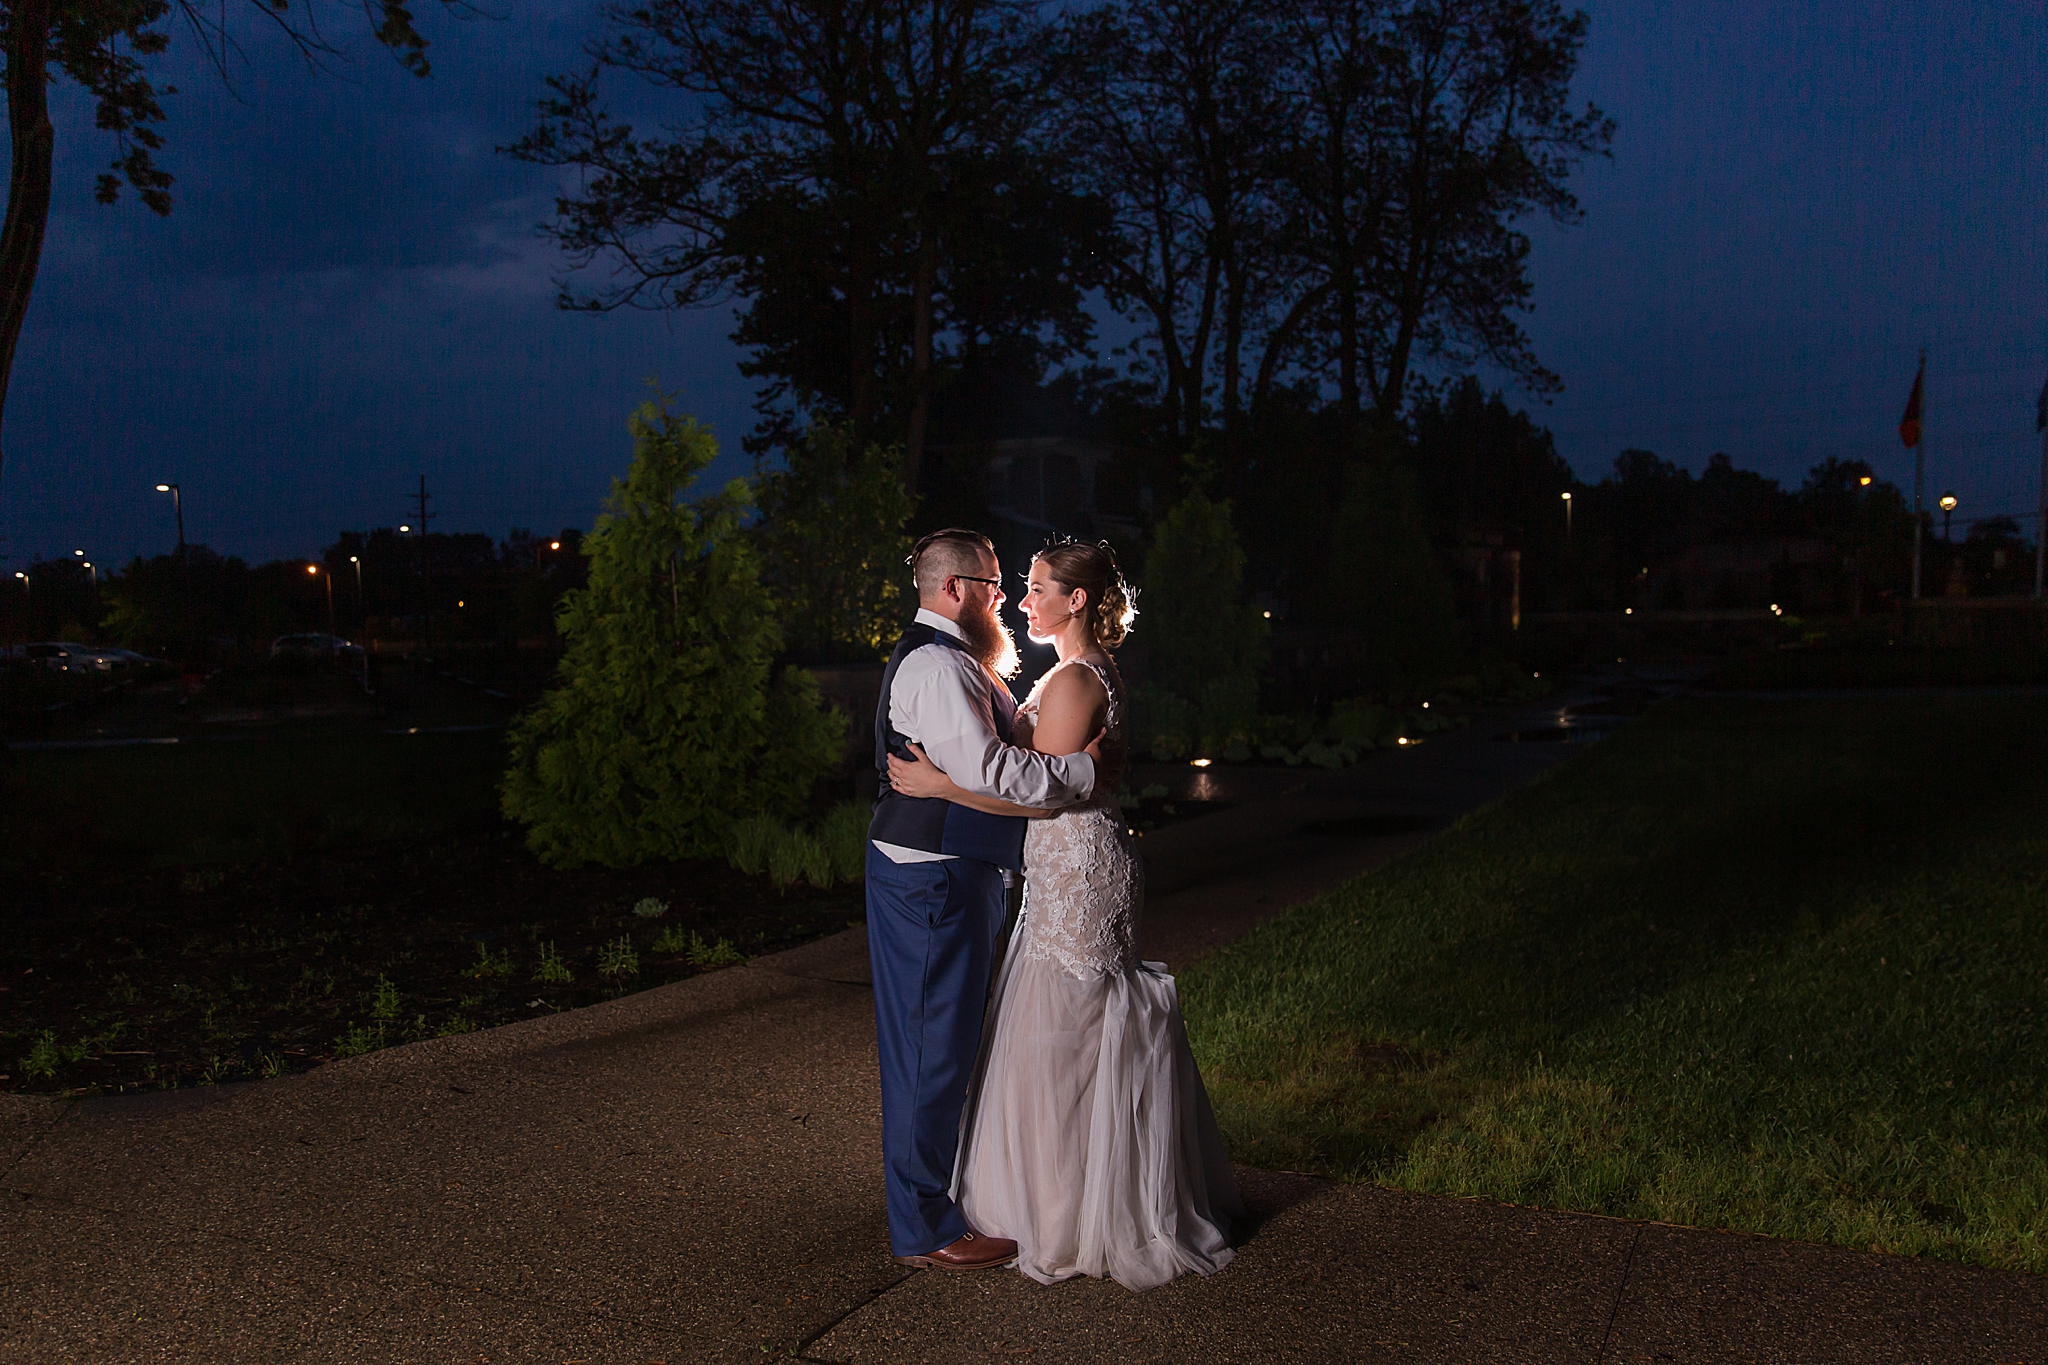 detroit-wedding-photographer-brownstown-event-center-wedding-photos-sam-josh-by-courtney-carolyn-photography_0092.jpg